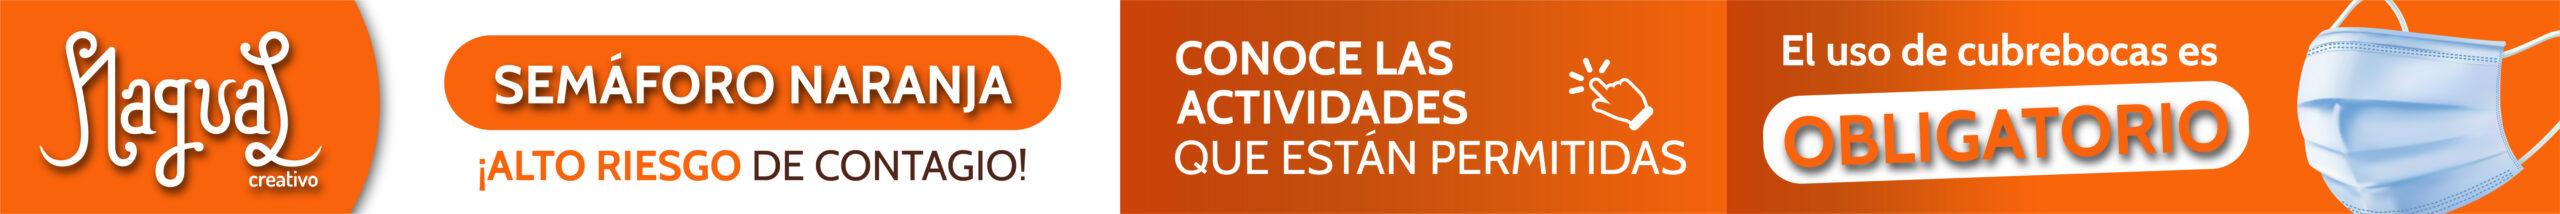 COVID - NAGUAL CREATIVO - SEMAFORO naranja